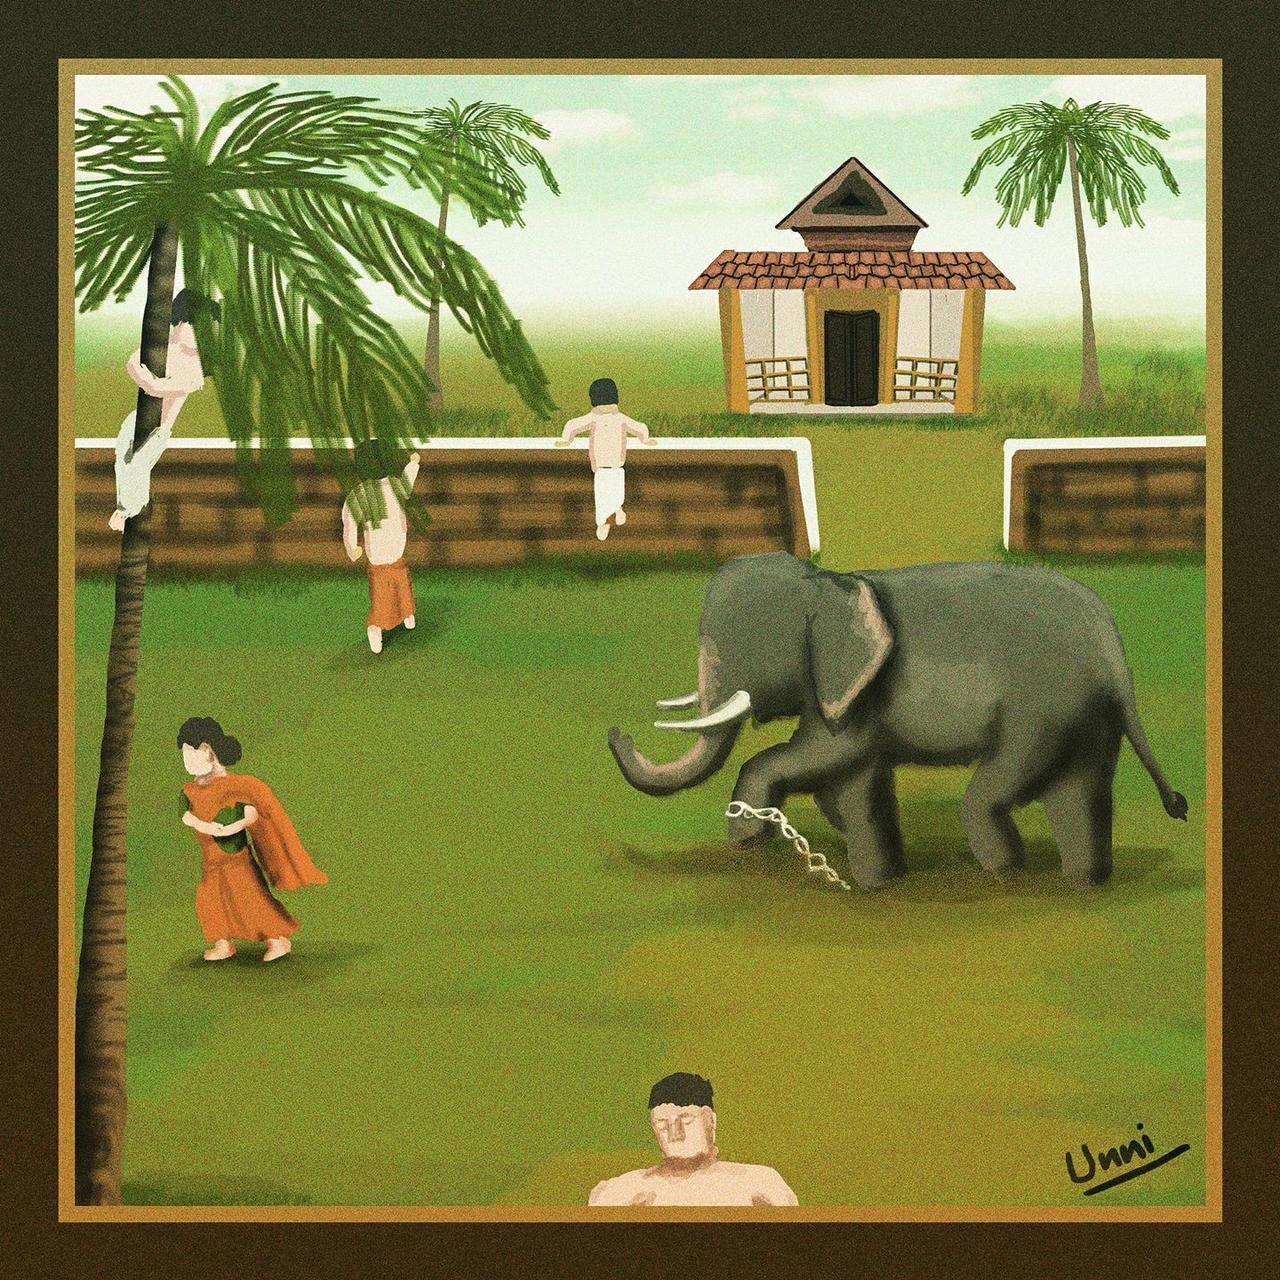 temple Run by unnibabu